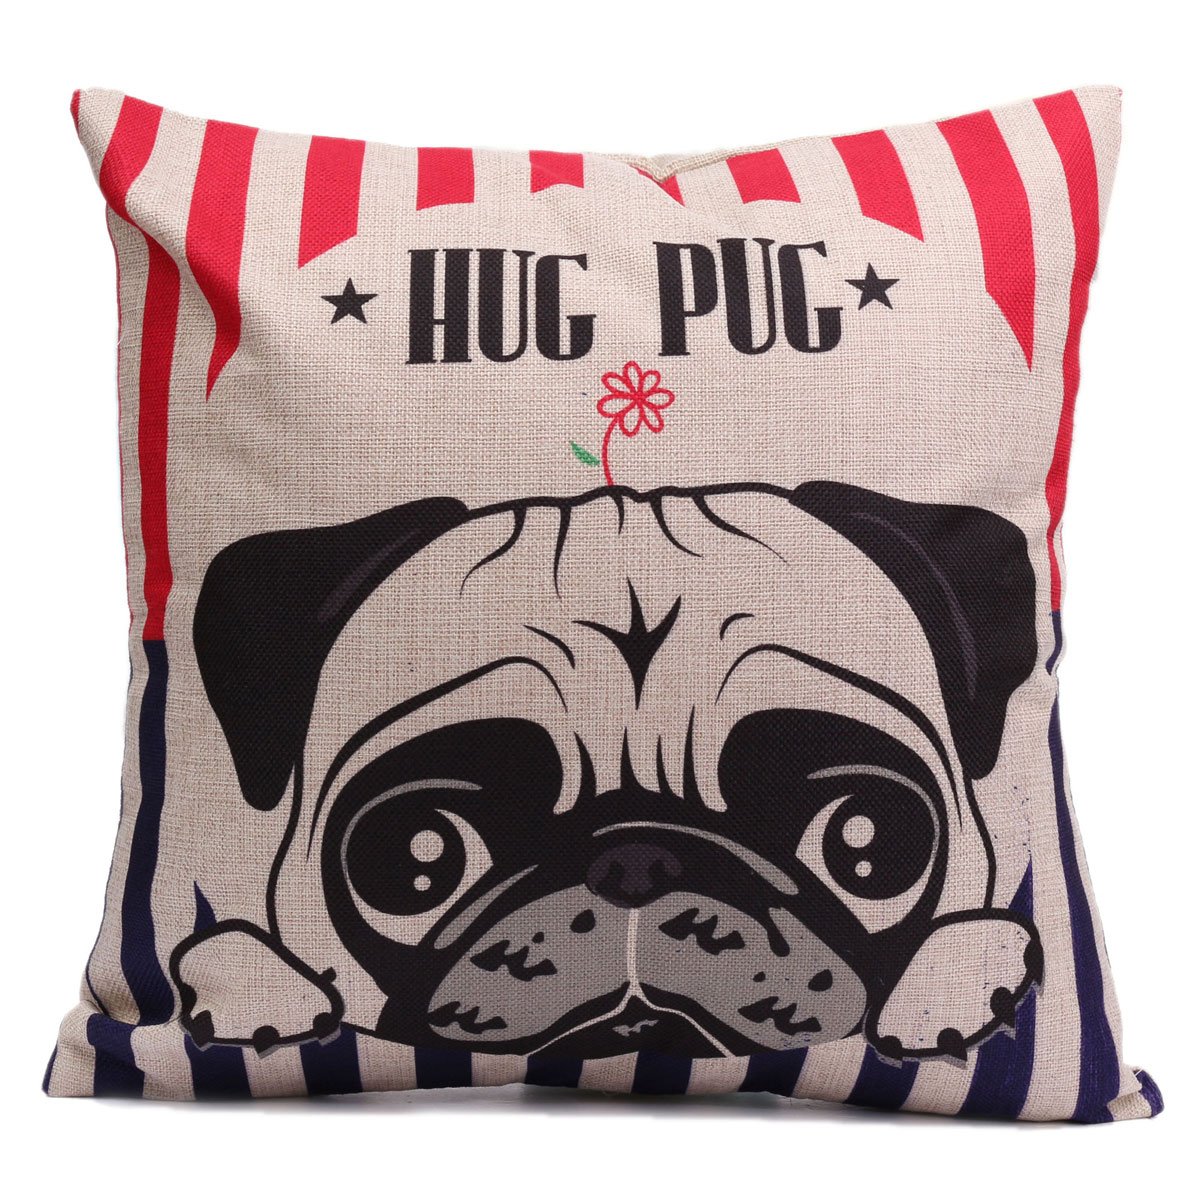 43 * 43cm Dog Home Cushion Cover Decor Square Throw Pillow Case Cute Animal